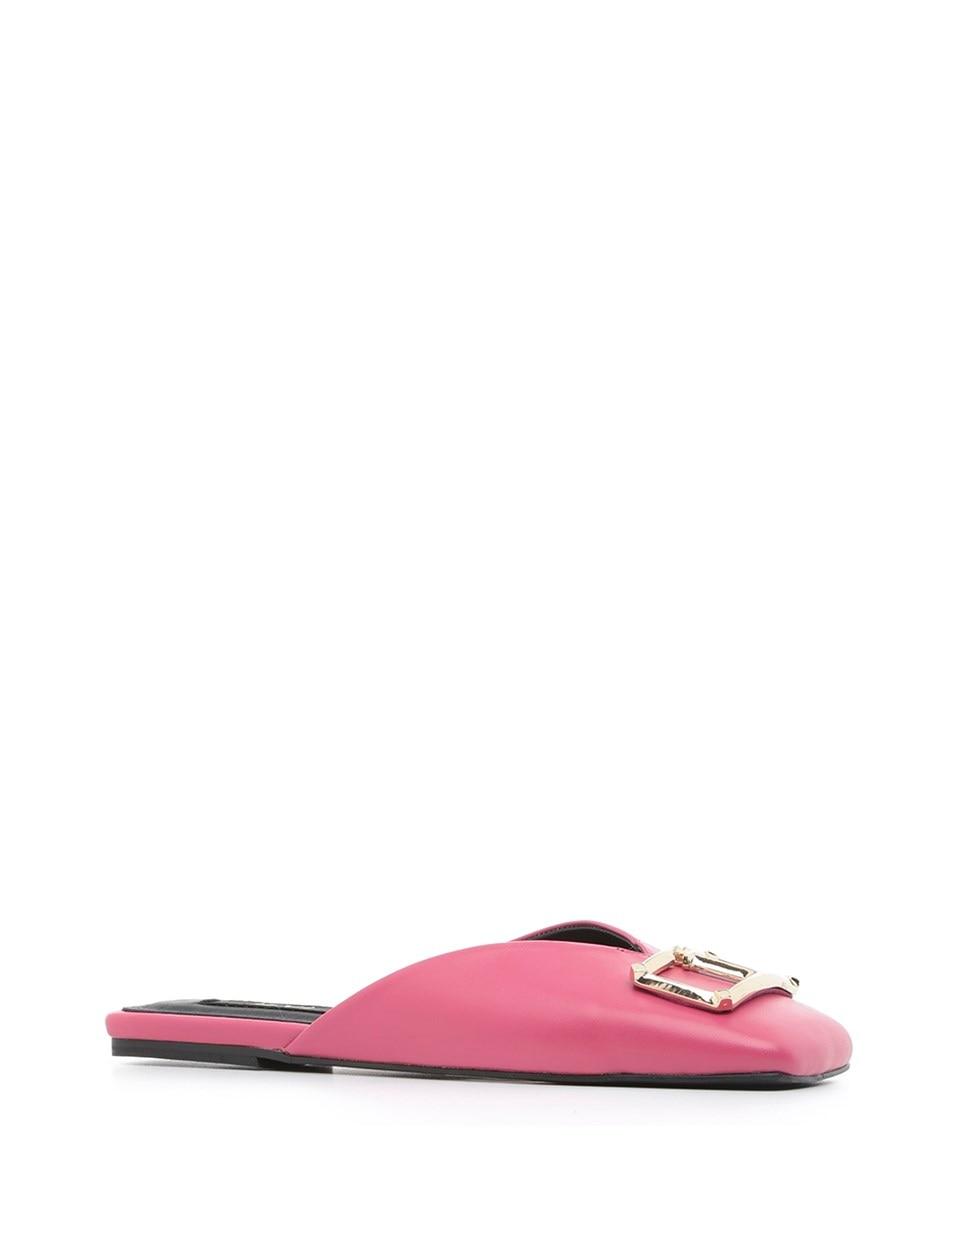 ILVi-cuir véritable fait main Murph femmes pantoufle noir Fuchsia femmes chaussures 2020